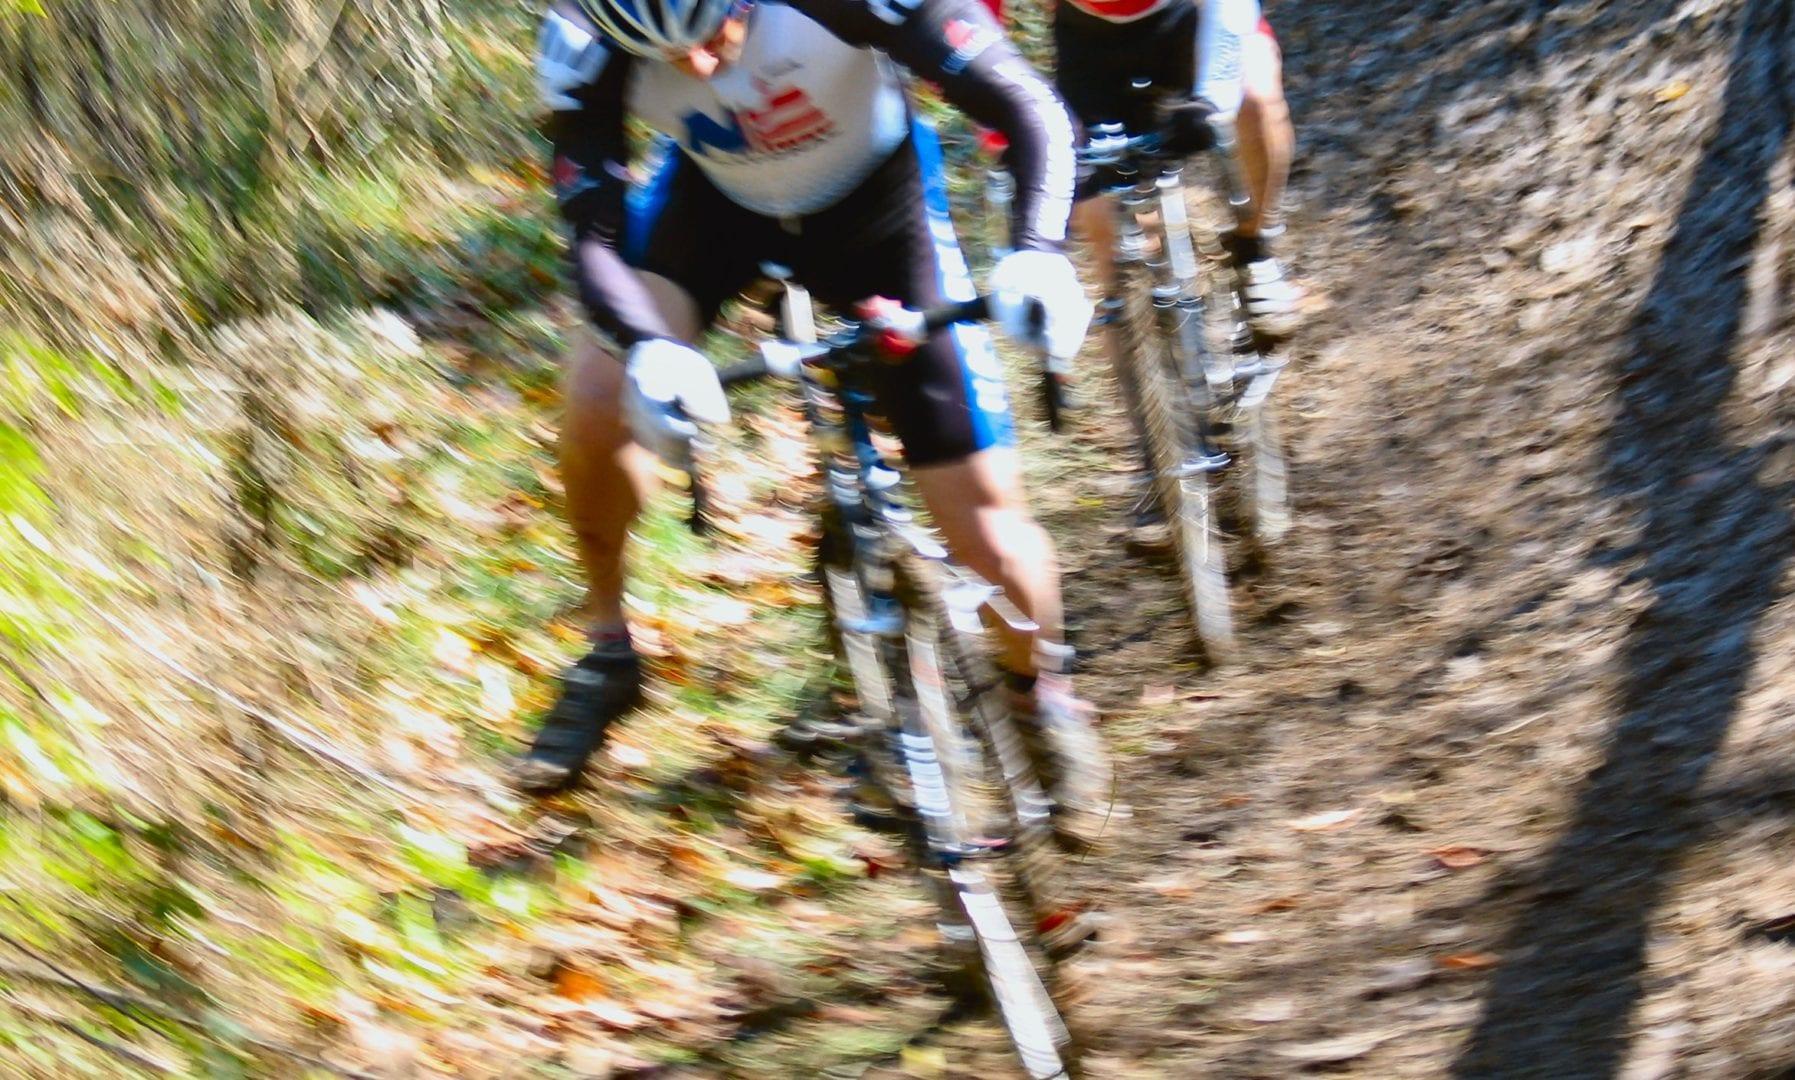 A blurry angled image of cyclists